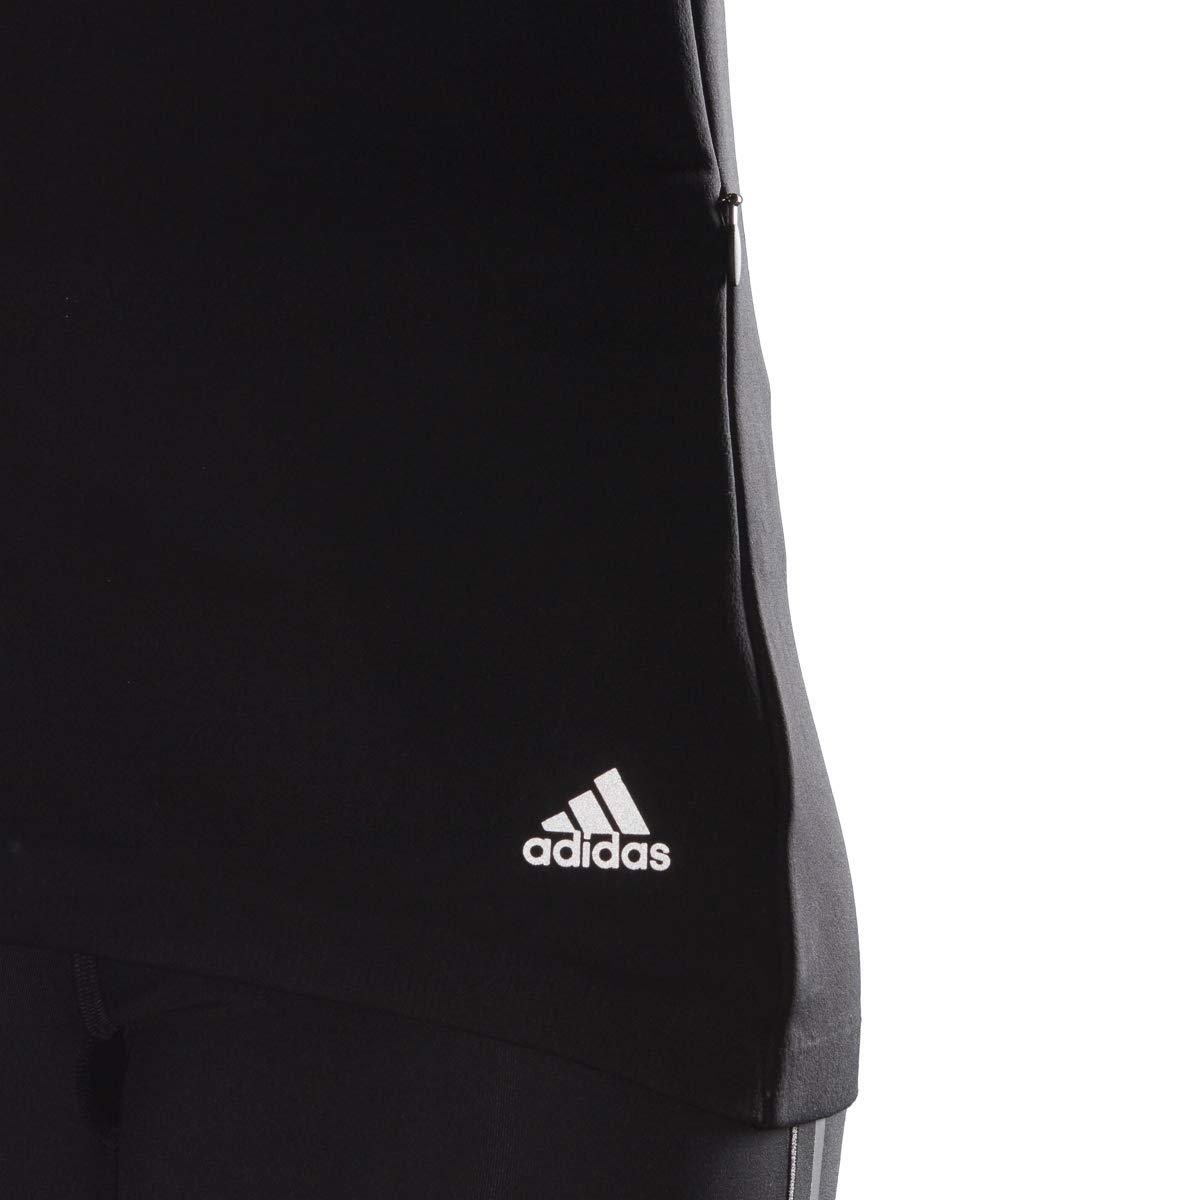 adidas Running Ultra Track Jacket, Black, Small by adidas (Image #1)